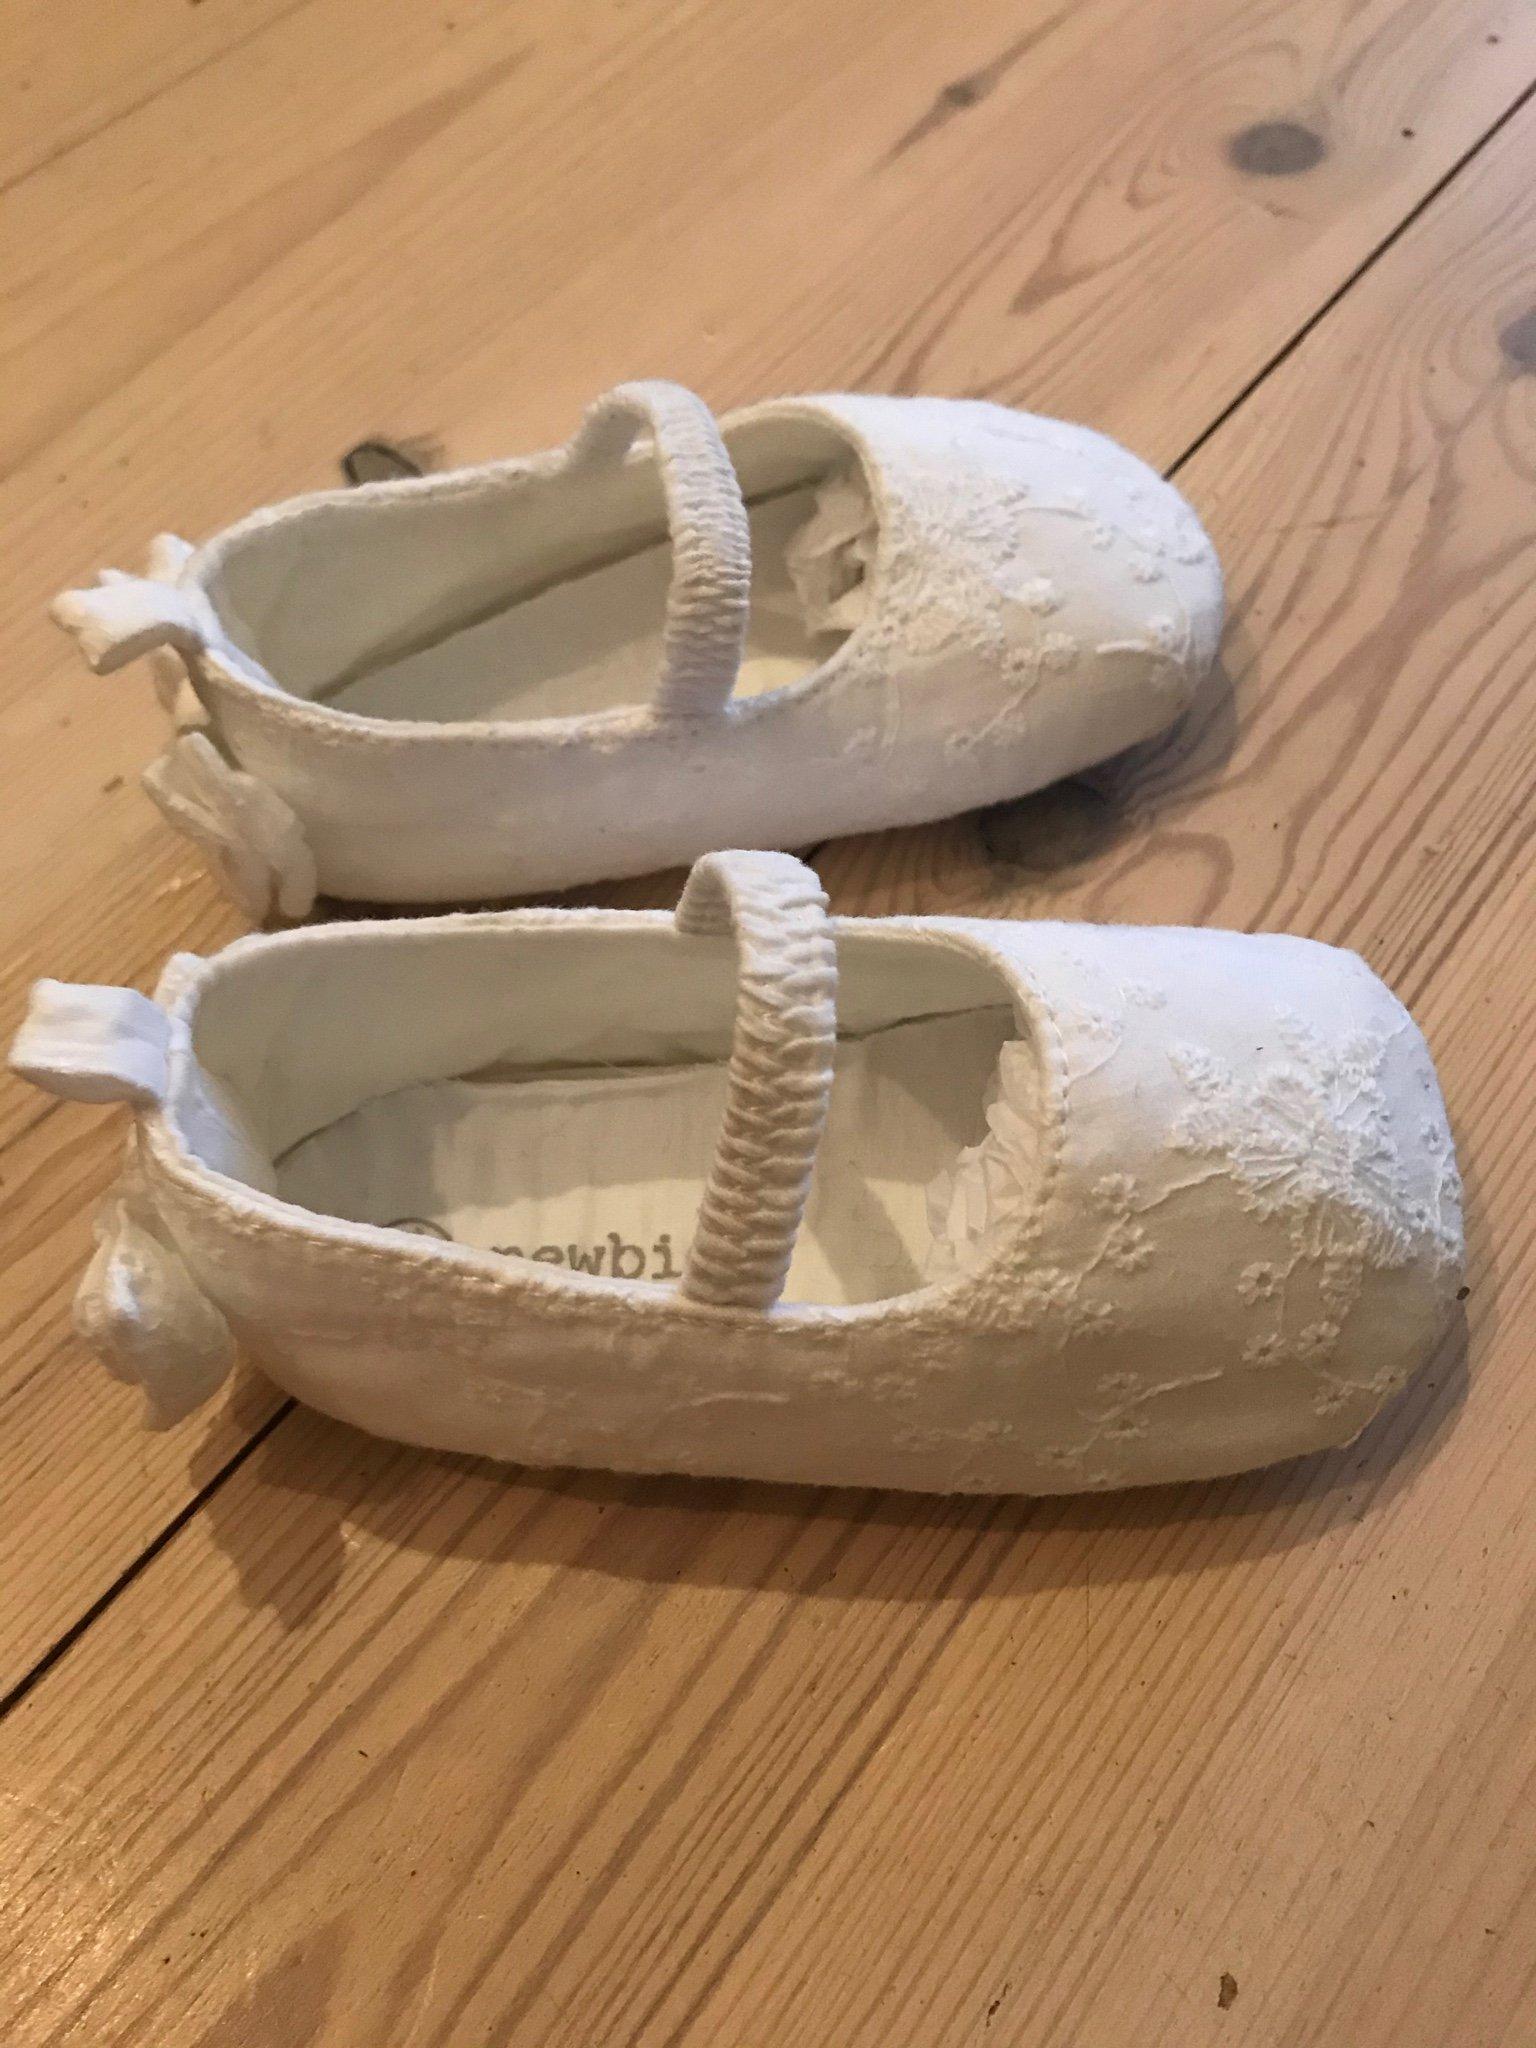 Newbie skor ballerina tossor strl 1920 vita i spets! OBS läs besk.